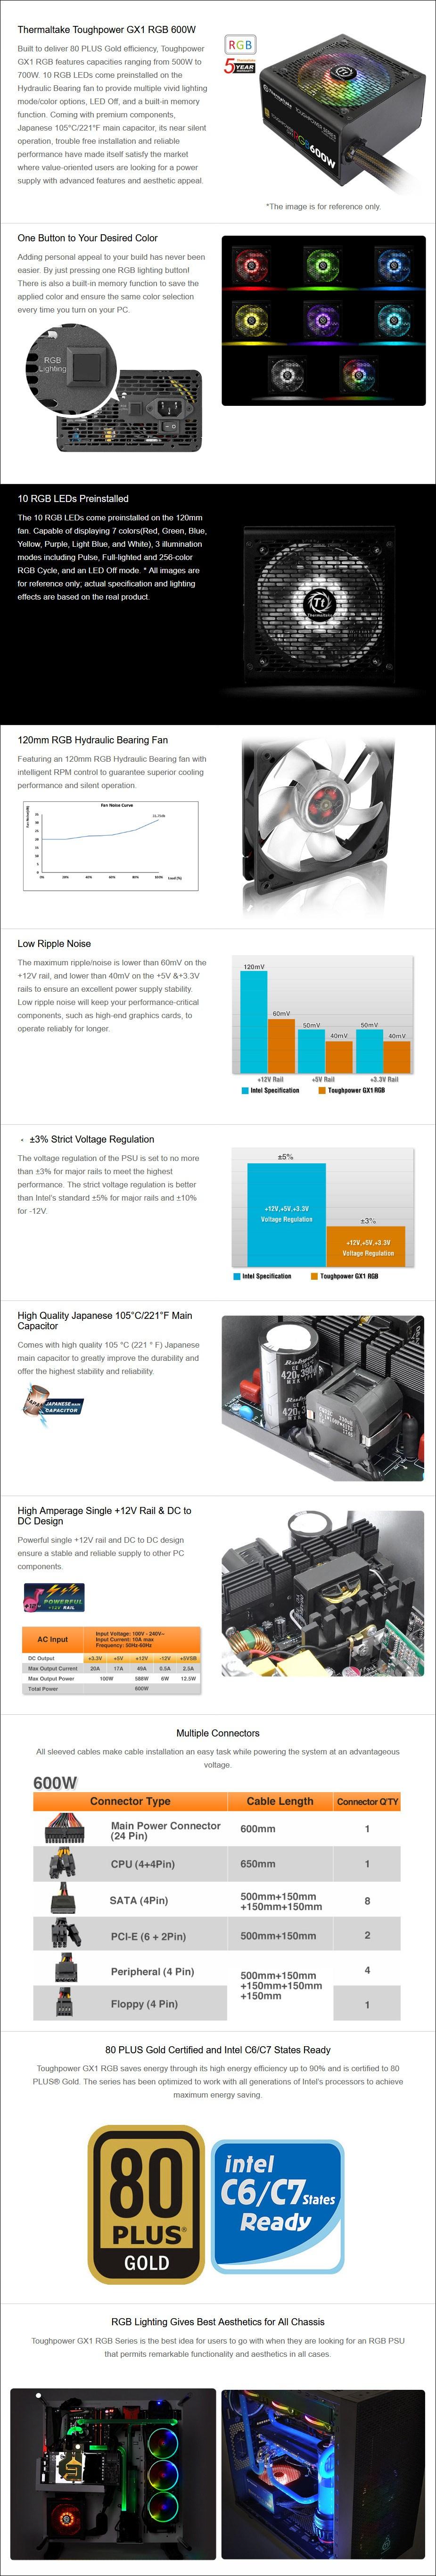 thermaltake-toughpower-gx1-rgb-600w-80-gold-nonmodular-power-supply-ac33552-5.jpg